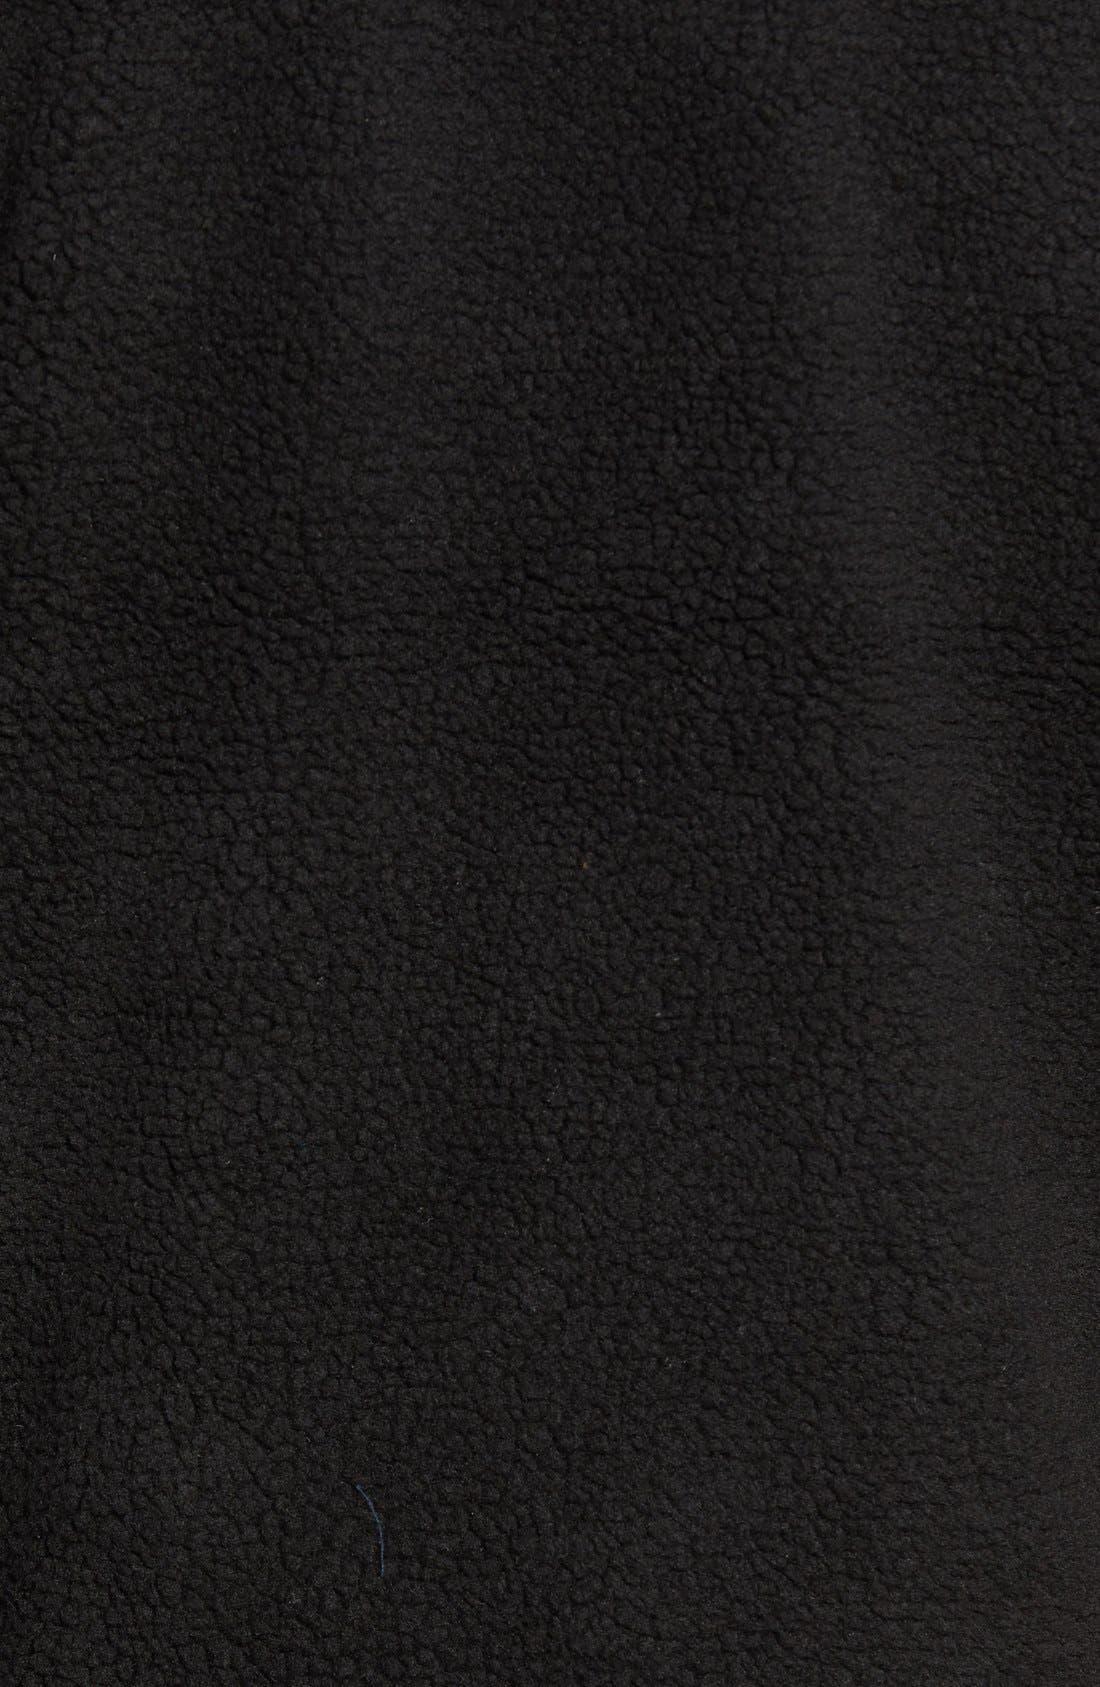 Mattawa Zip Fleece Jacket,                             Alternate thumbnail 3, color,                             001